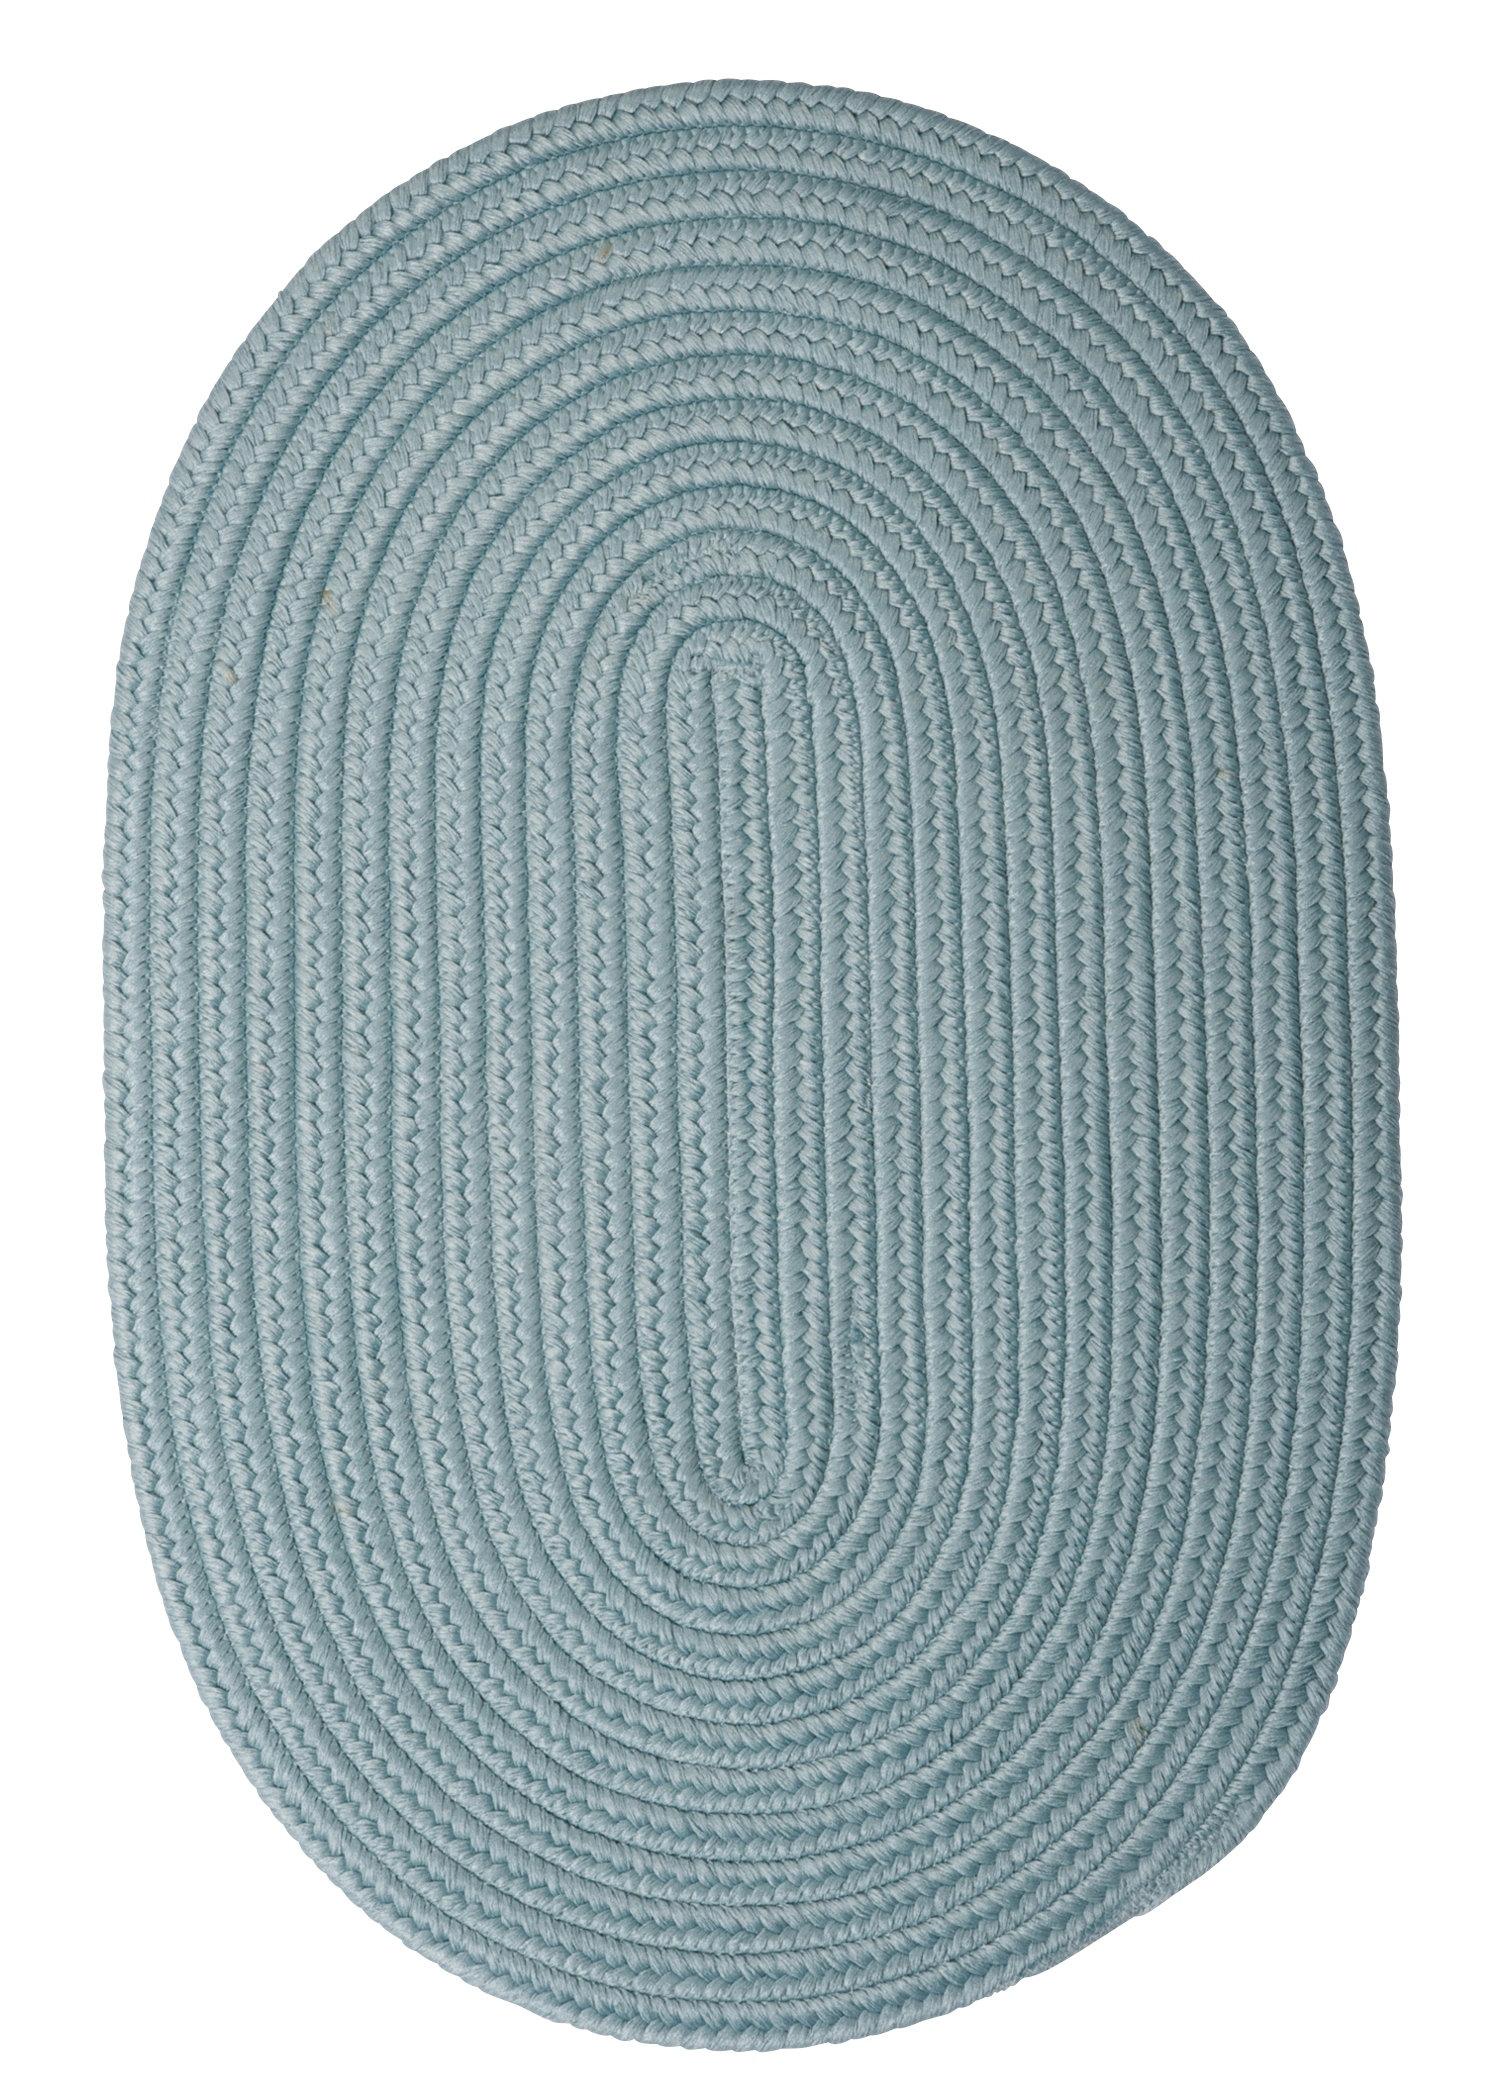 Winston Porter Mcintyre Braided Pale Blue Area Rug Reviews Wayfair